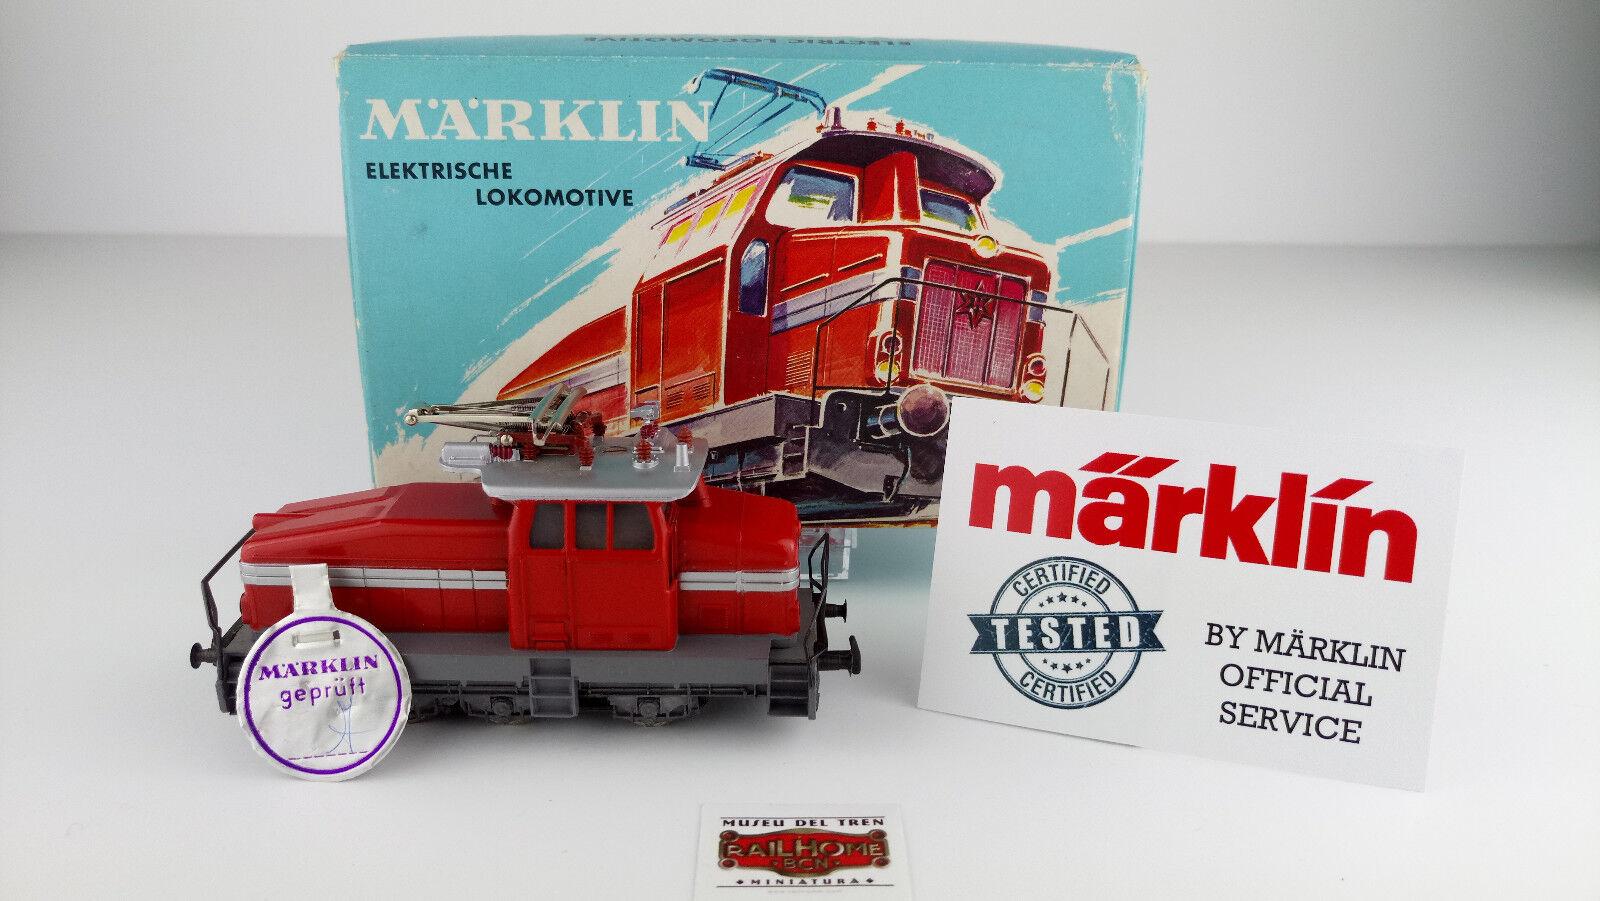 MARKLIN HO 3044 - E-LOK EA 800 - TESTATA - MOLTO BUON STATO - PRUFSIEGEL - ÖVP